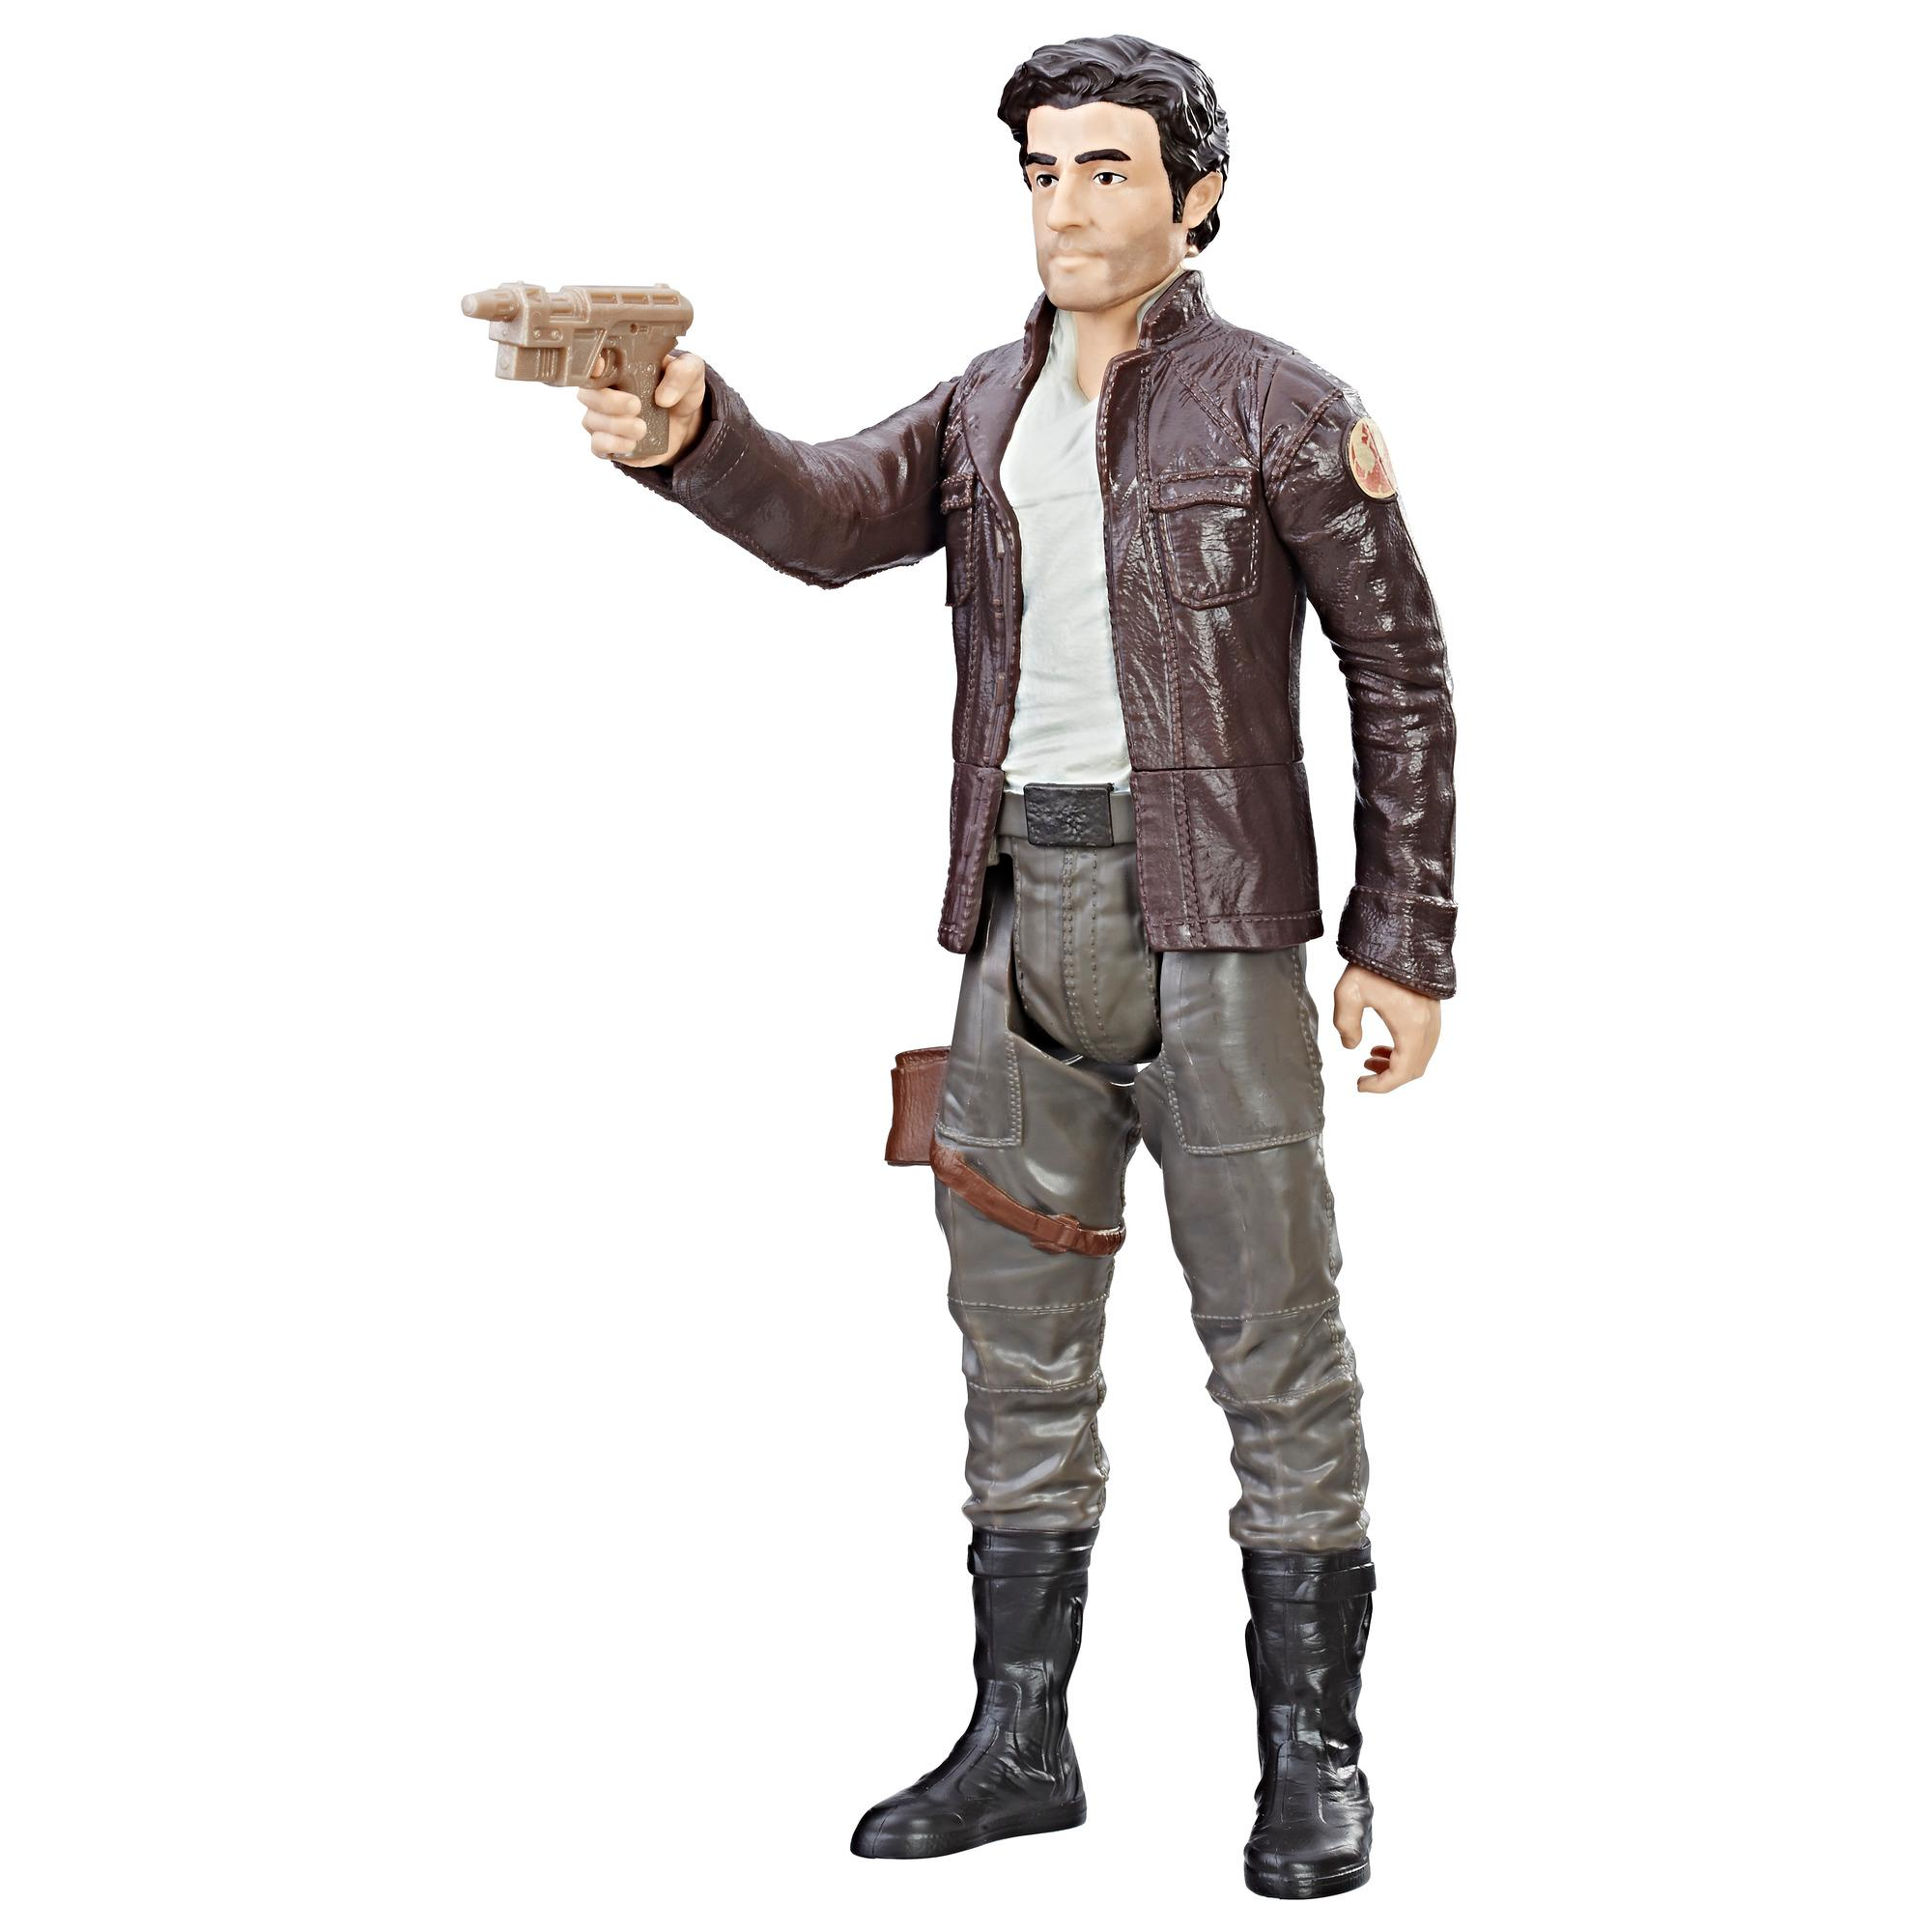 Star Wars: The Last Jedi 12-inch Captain Poe Dameron Figure